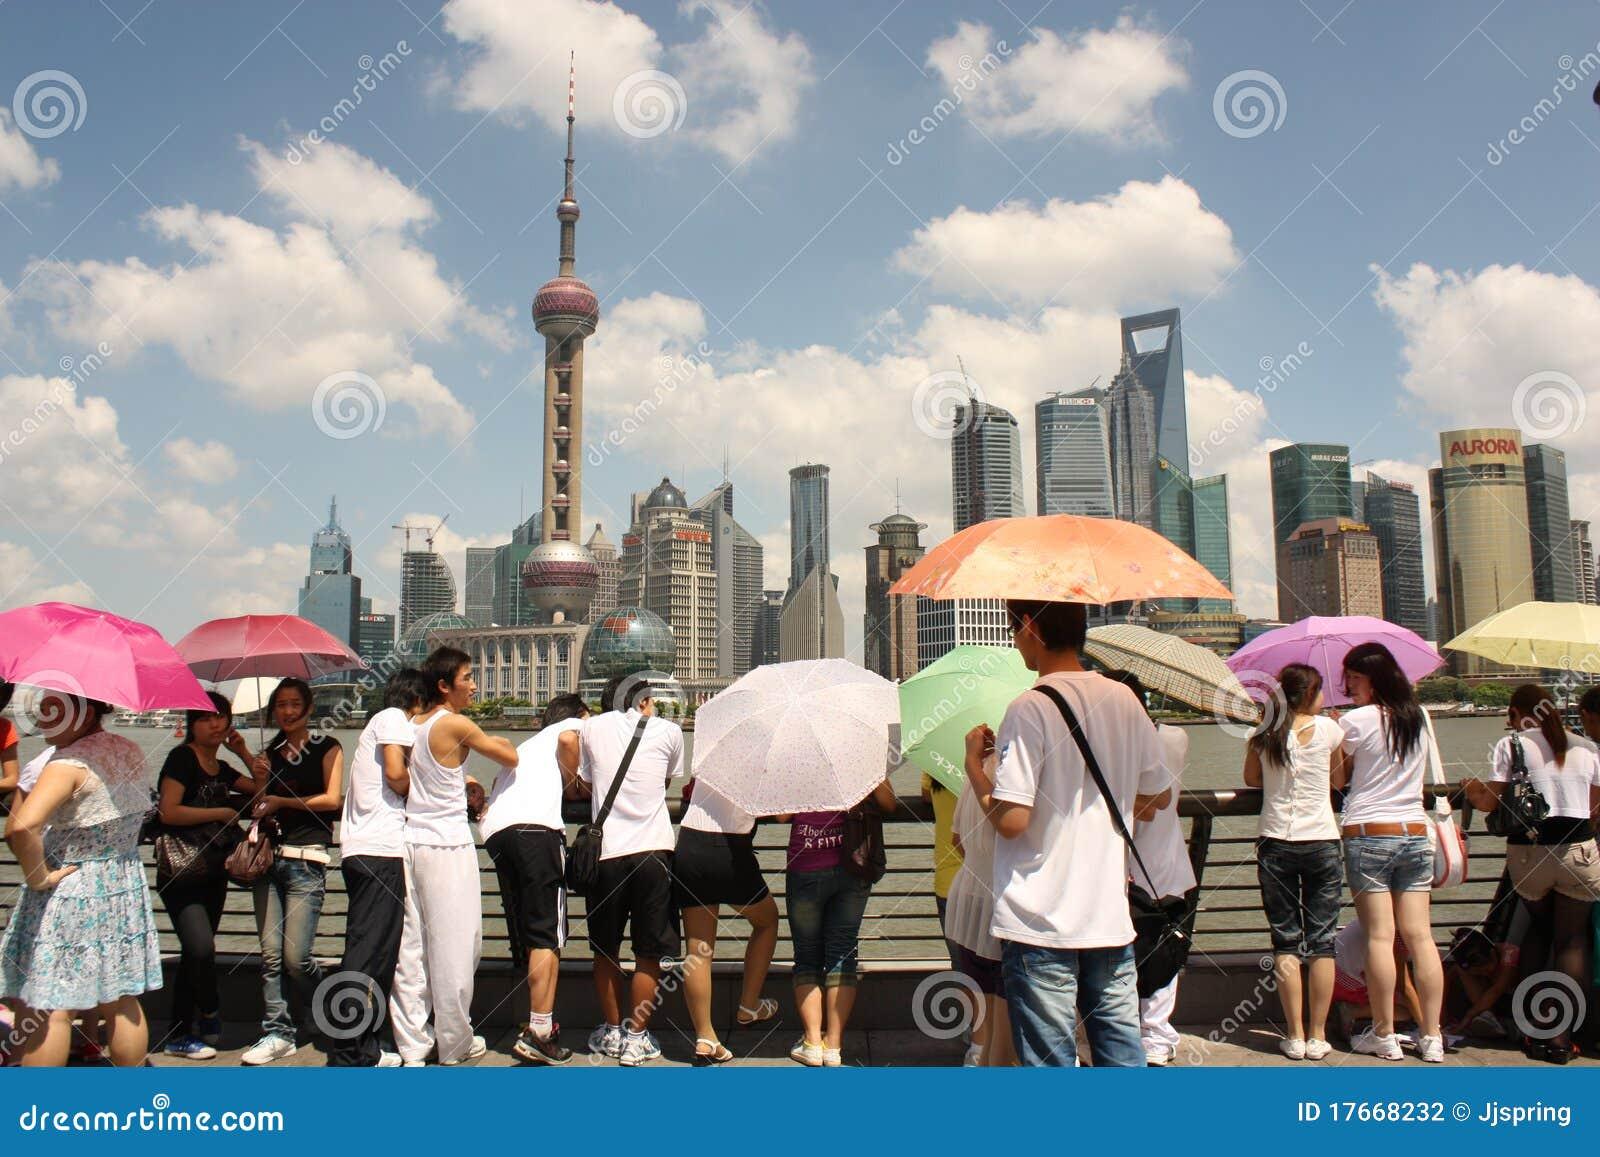 Shanghai skyline with tourists